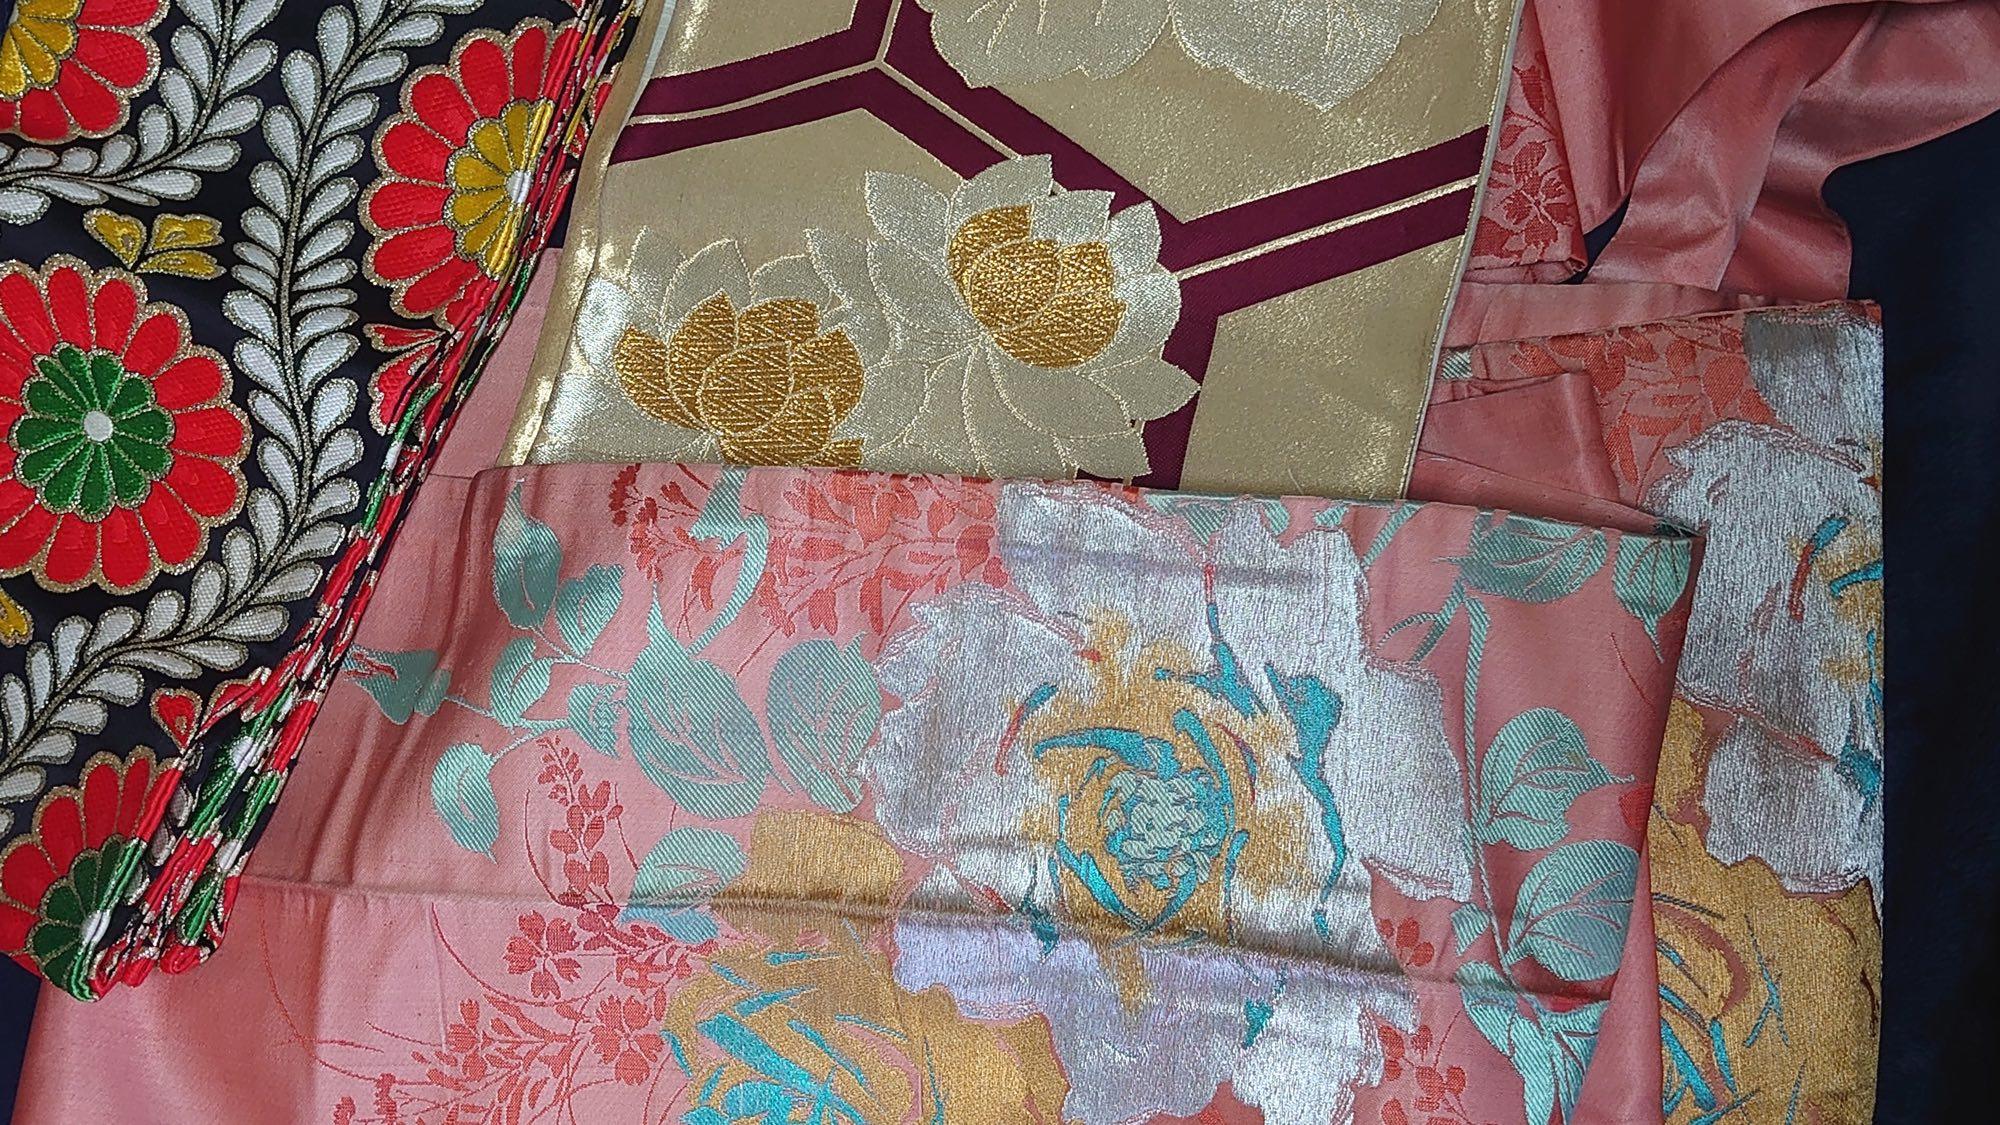 Kimono Fashion With A Twist - Obi layered out